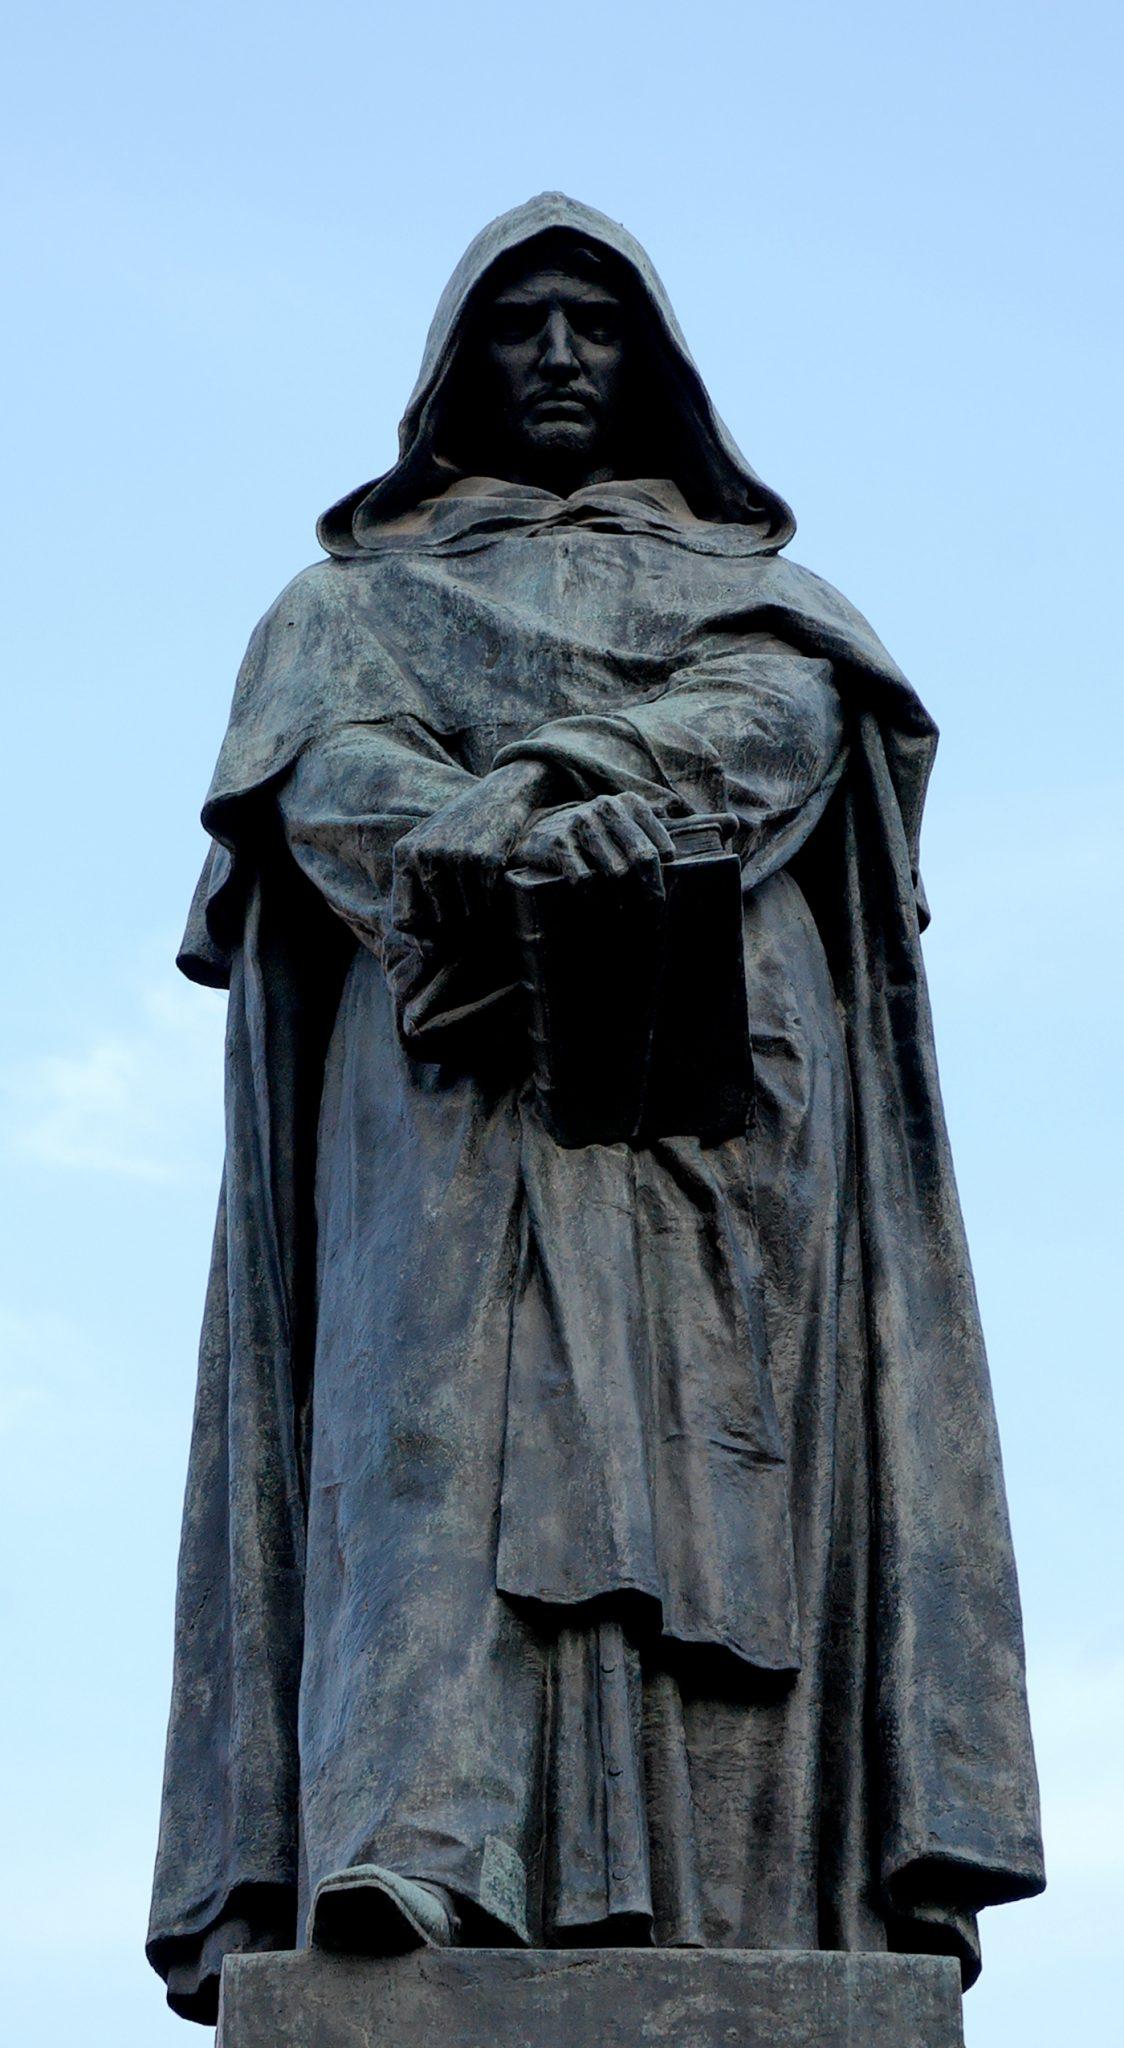 Storia del pensiero filosofico: Giordano Bruno